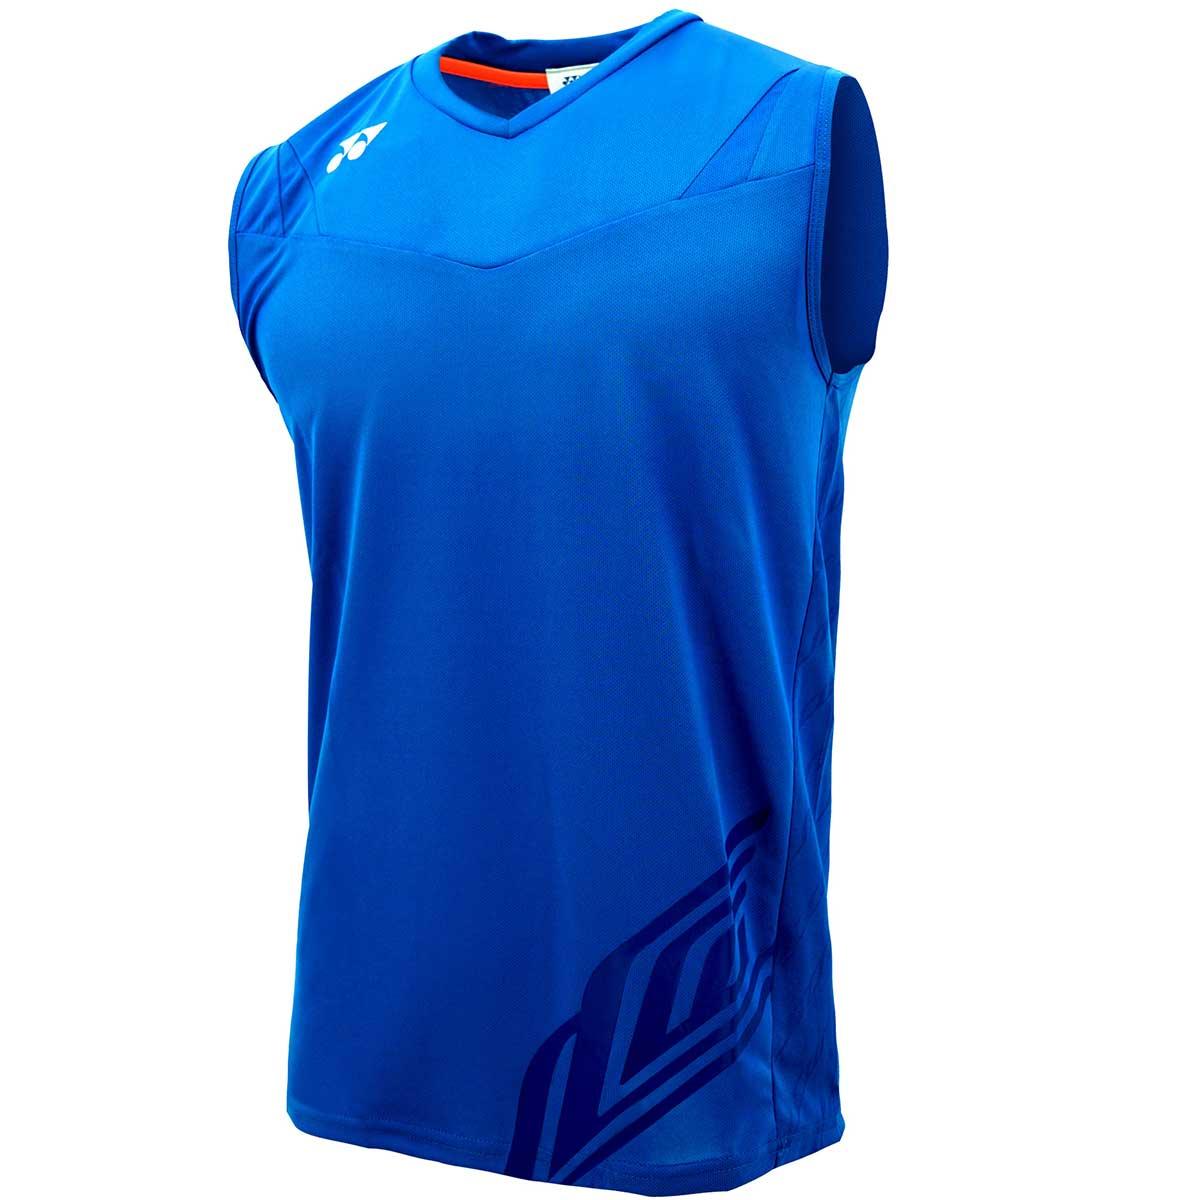 eb21bedb4c8e9 Buy Yonex LCW Men s Sleeveless Shirt Online India